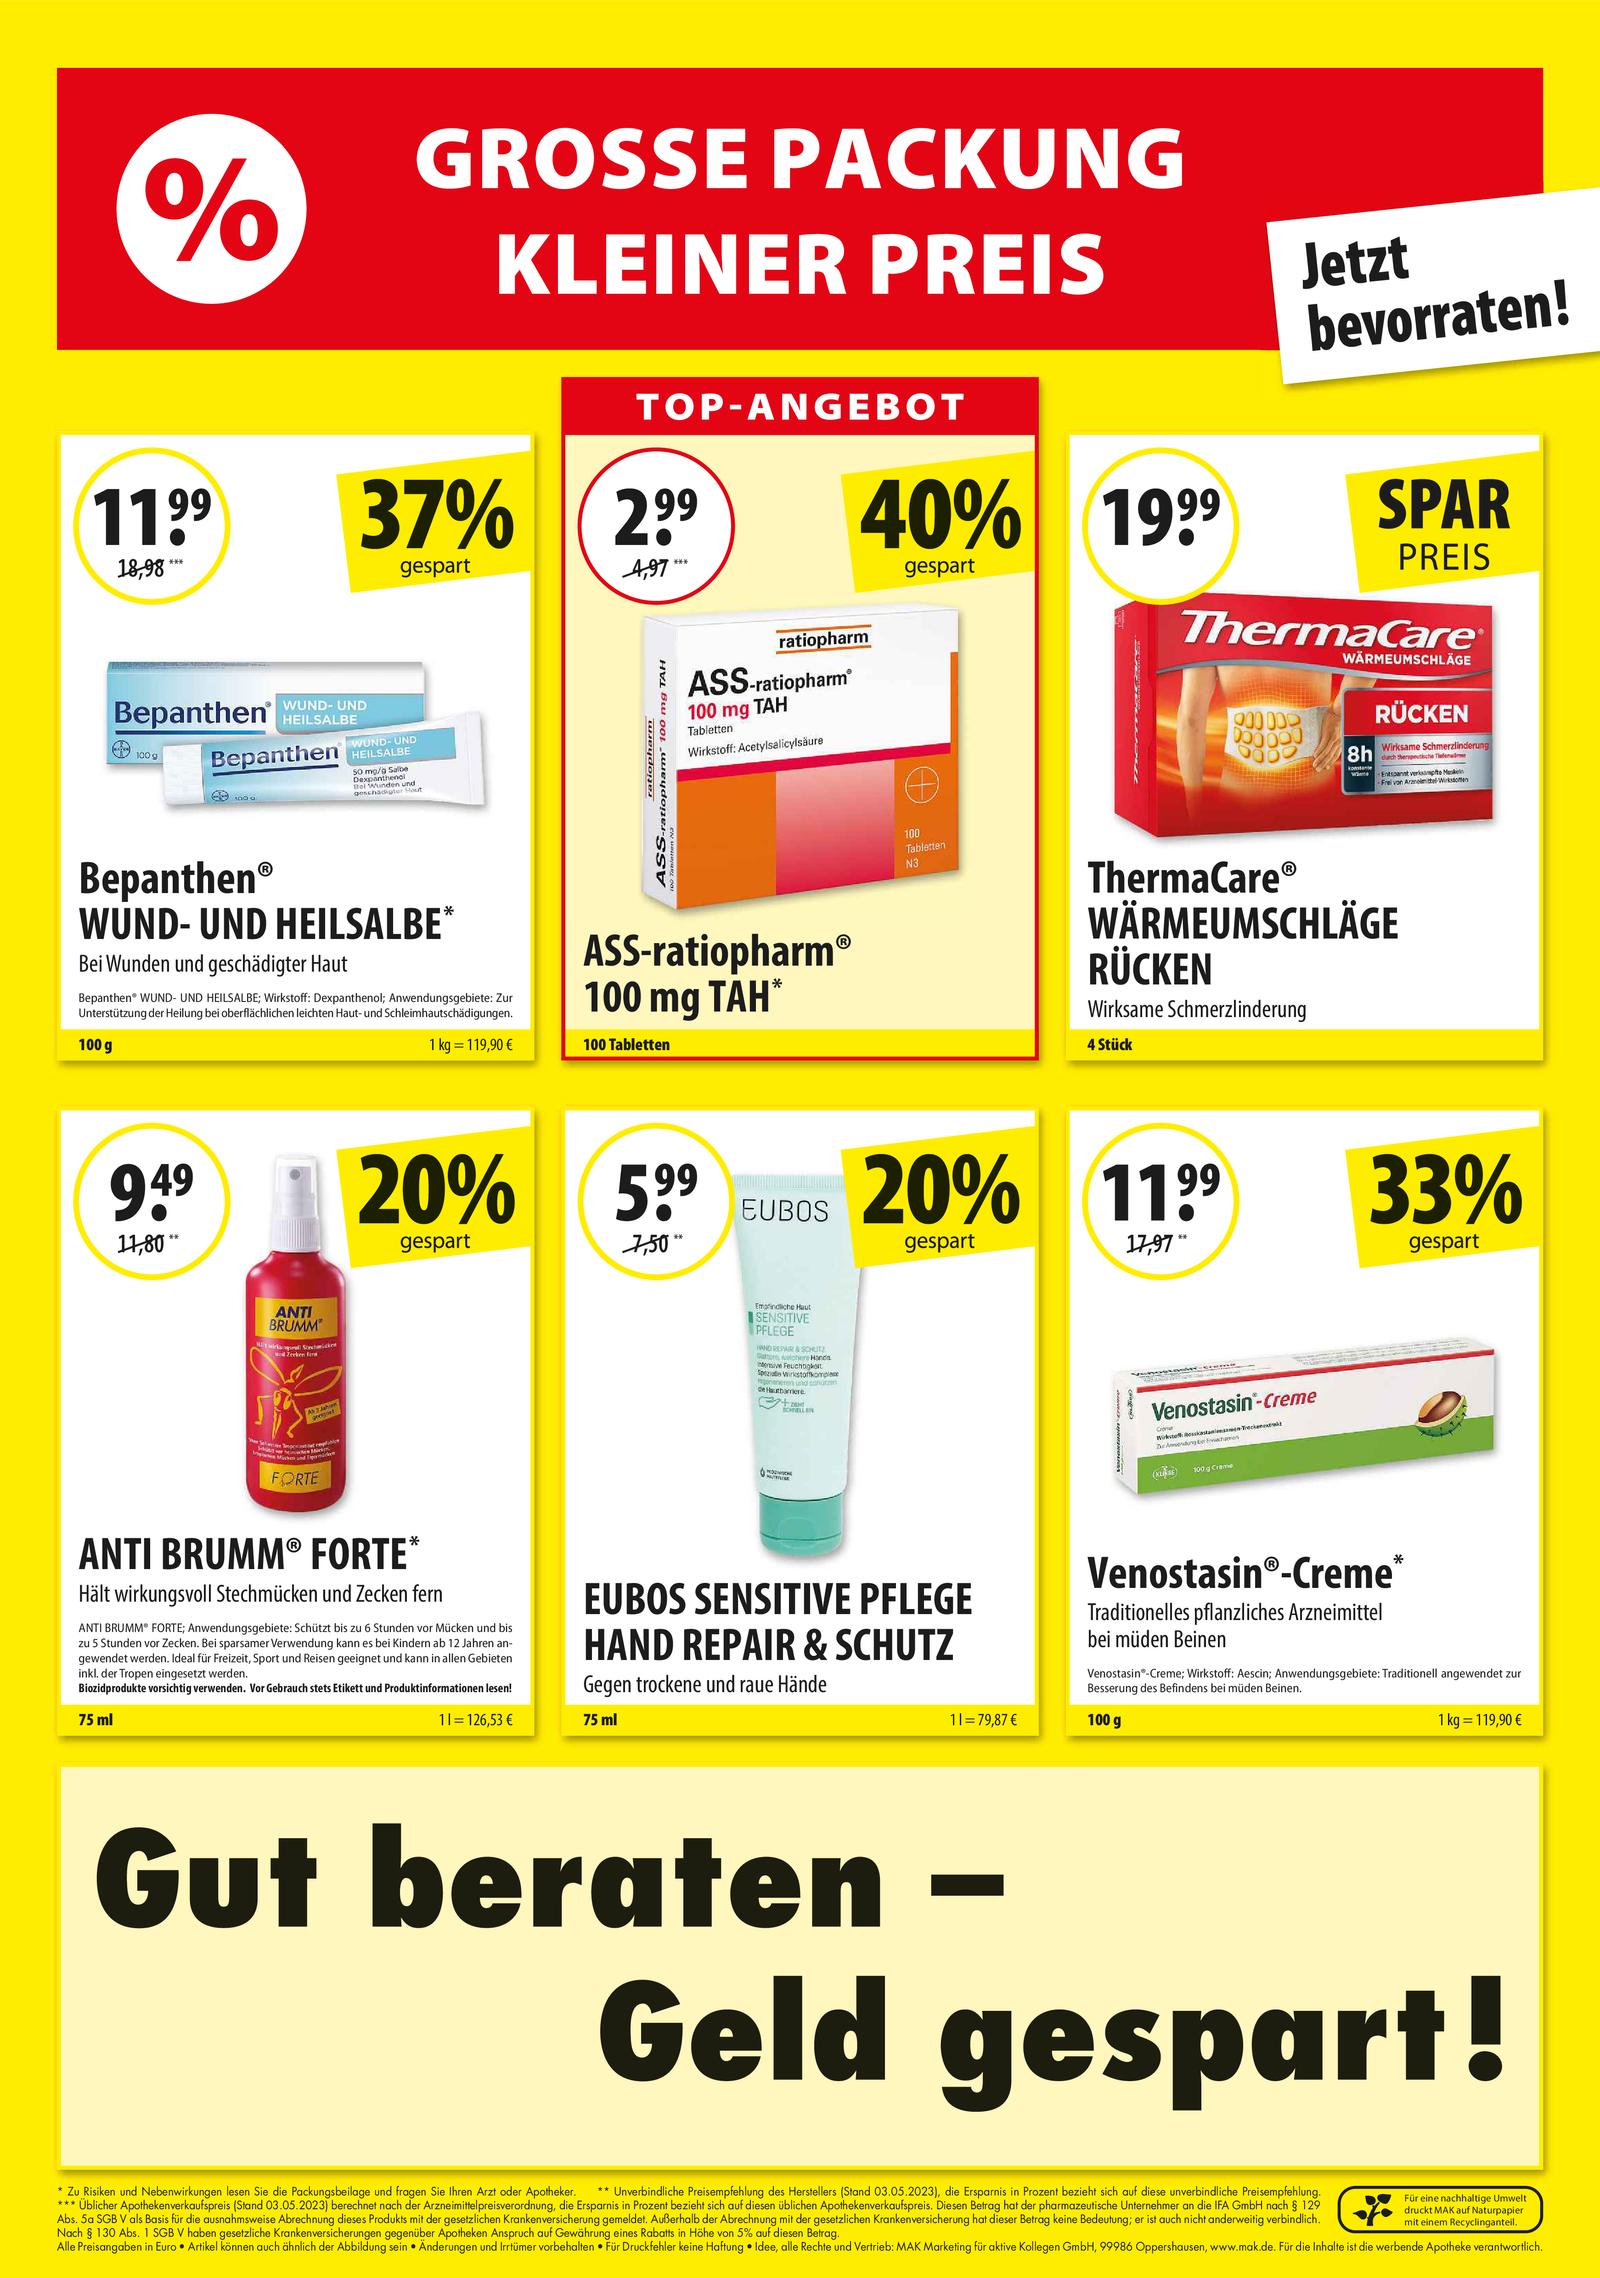 https://mein-uploads.apocdn.net/17463/leaflets/17463_flyer-Seite4.png